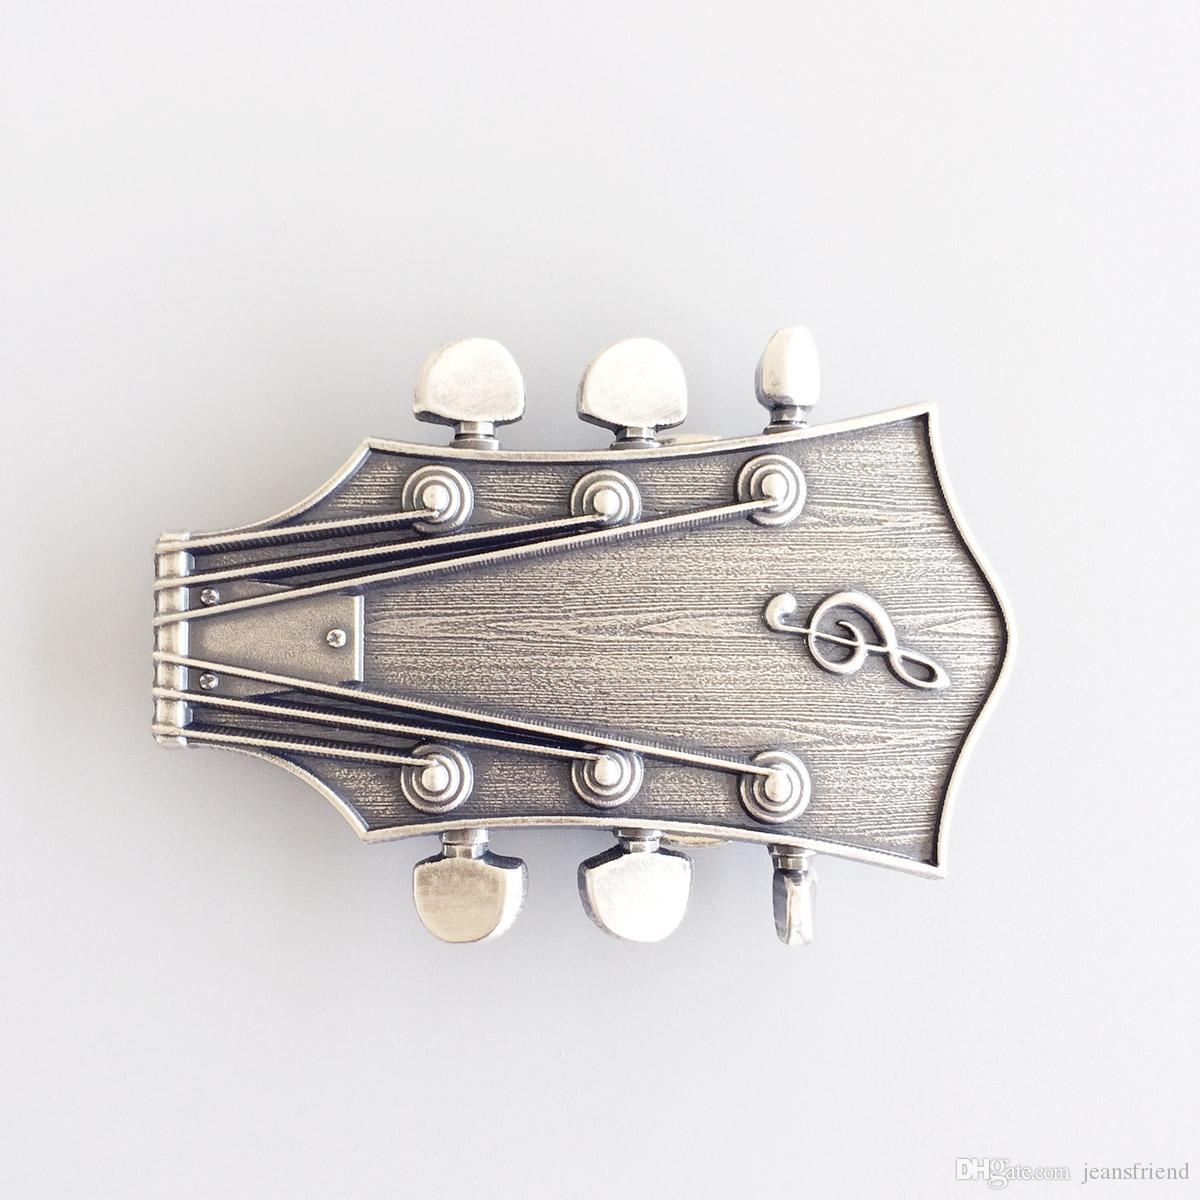 d7478cb13b3f New Vintage Silver Plated Guitar Head Music Belt Buckle Gurtelschnalle  Boucle De Ceinture BUCKLE MU044SL Brand New Canada 2018 From Jeansfriend,  ...